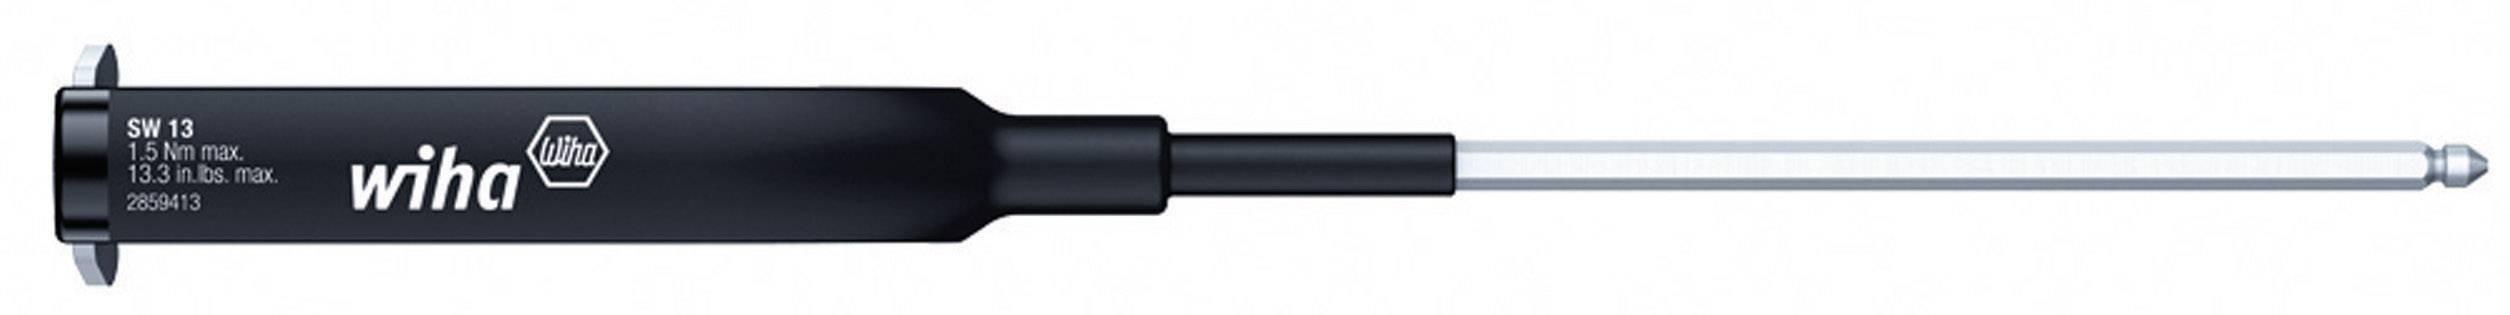 Bit momentového kľúča Wiha Torque 2859 36414, 218 mm